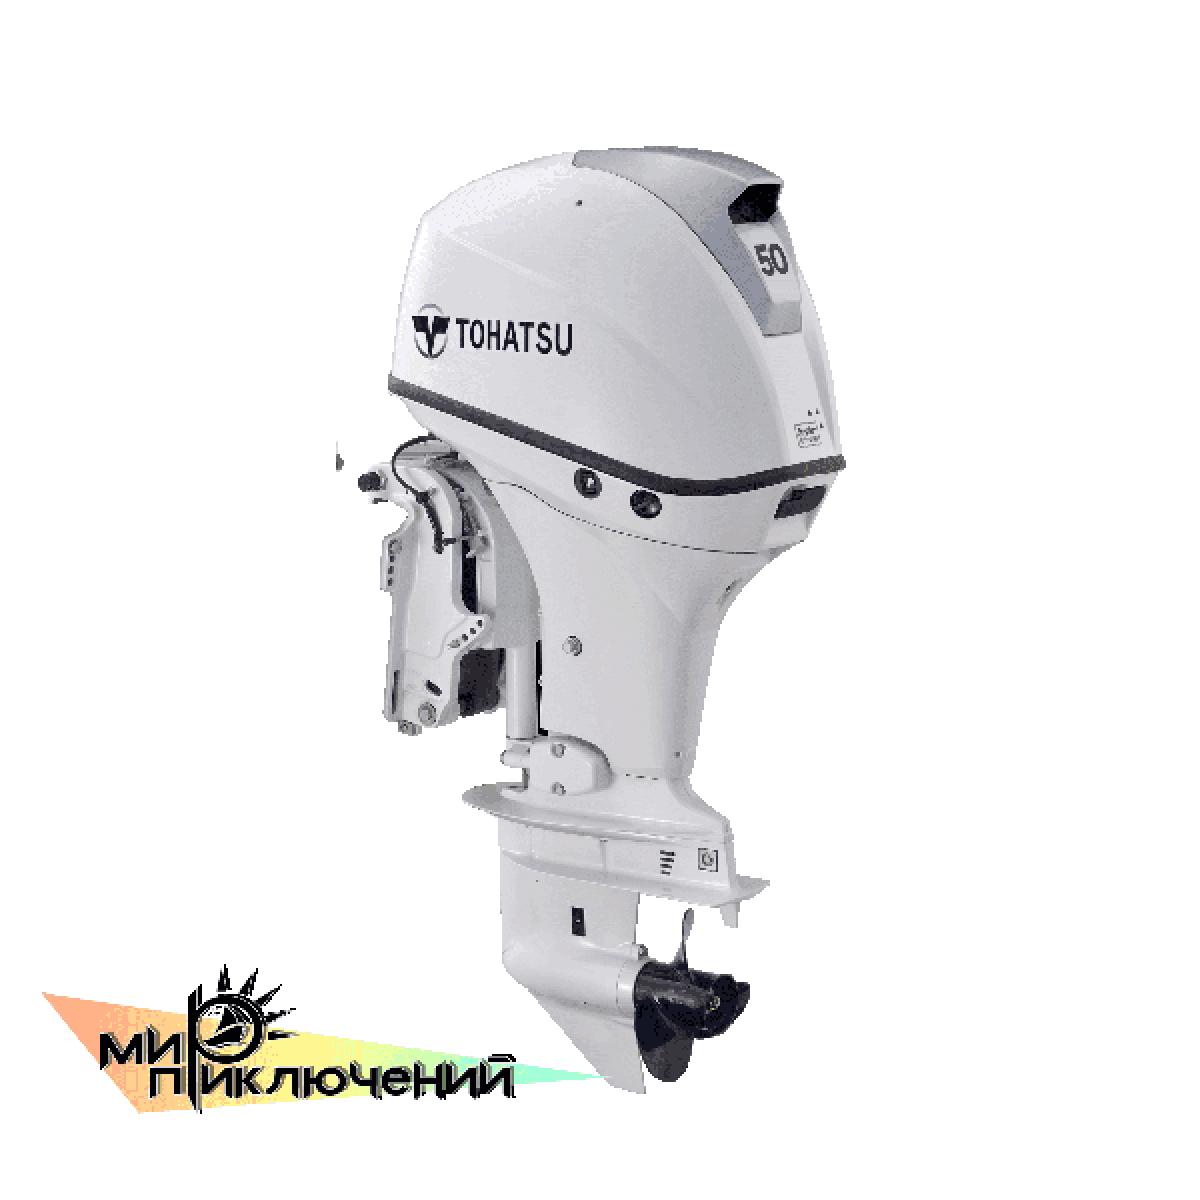 Tohatsu MFS 50 WHITE ETL, 4 х тактный подвесной лодочный мотор Тохатсу 50 л с